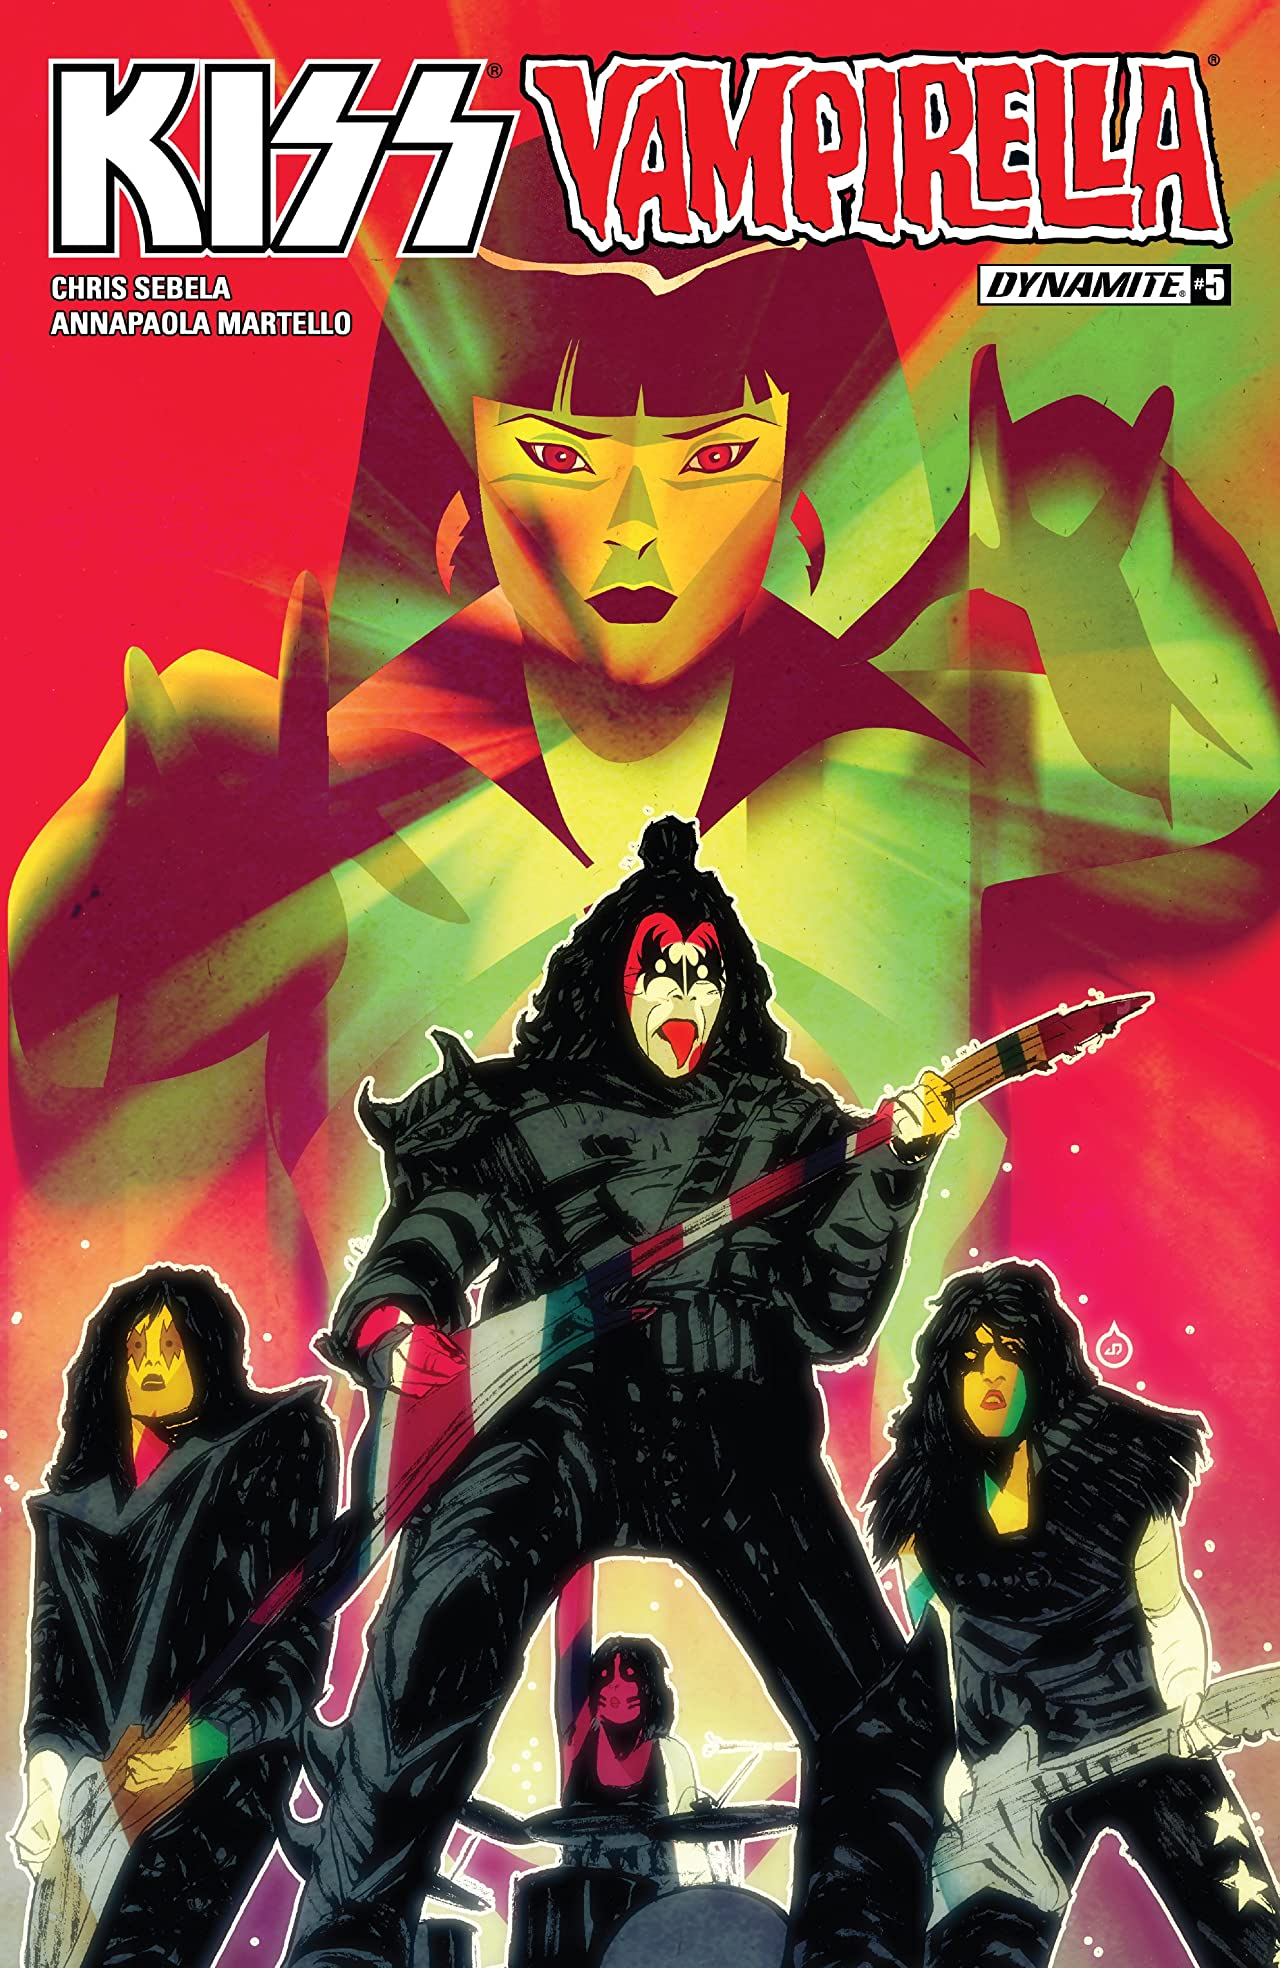 Kiss/Vampirella #5